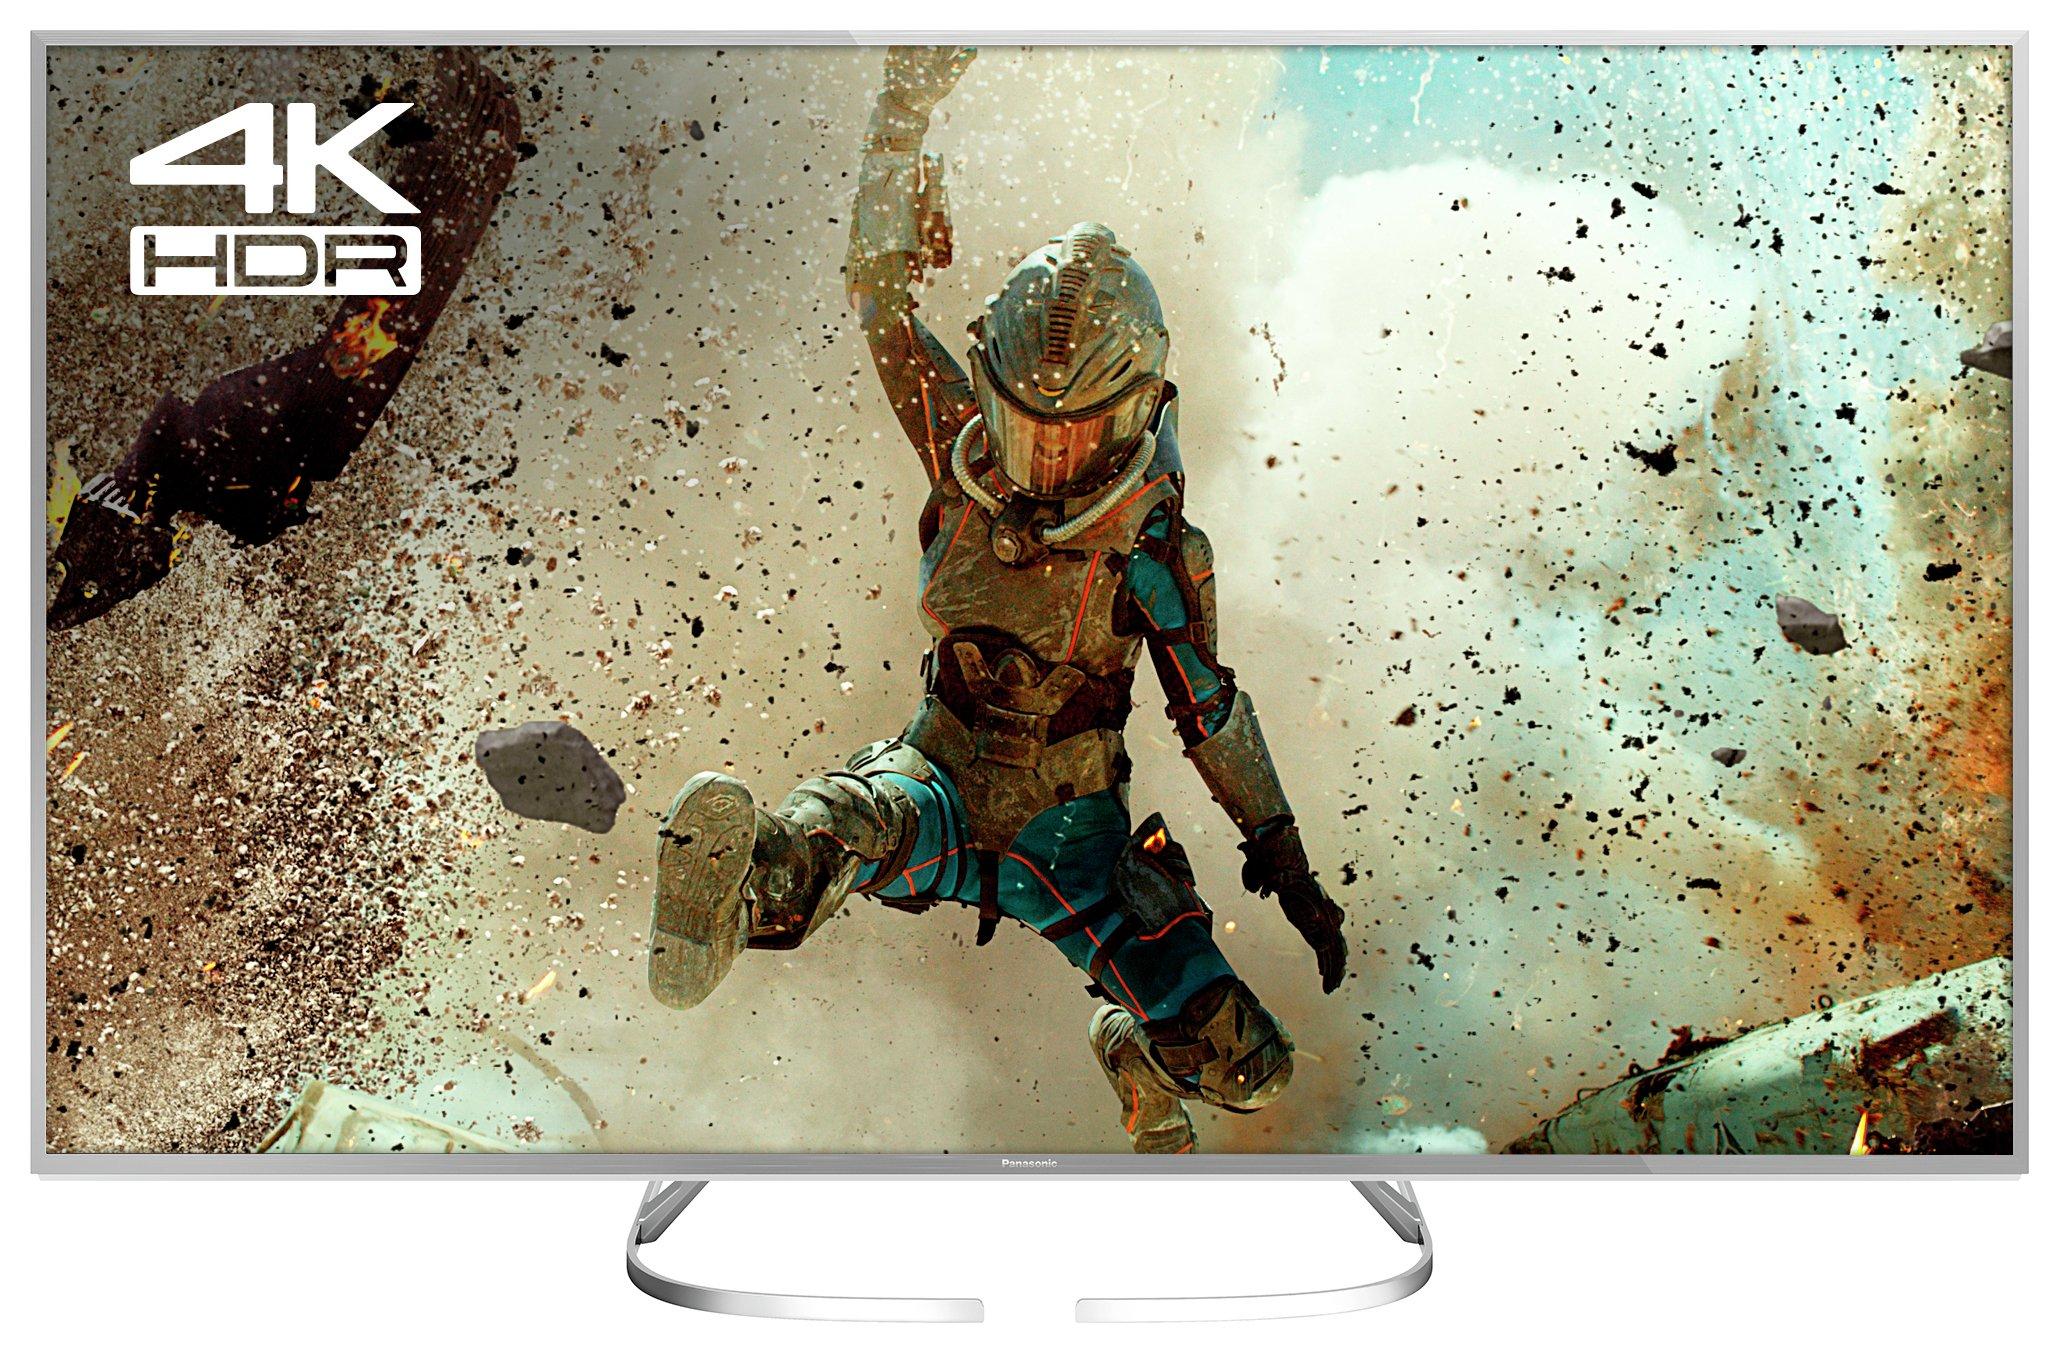 Panasonic 58TX-58EX700B 58 Inch Smart 4K Ultra HD TV.